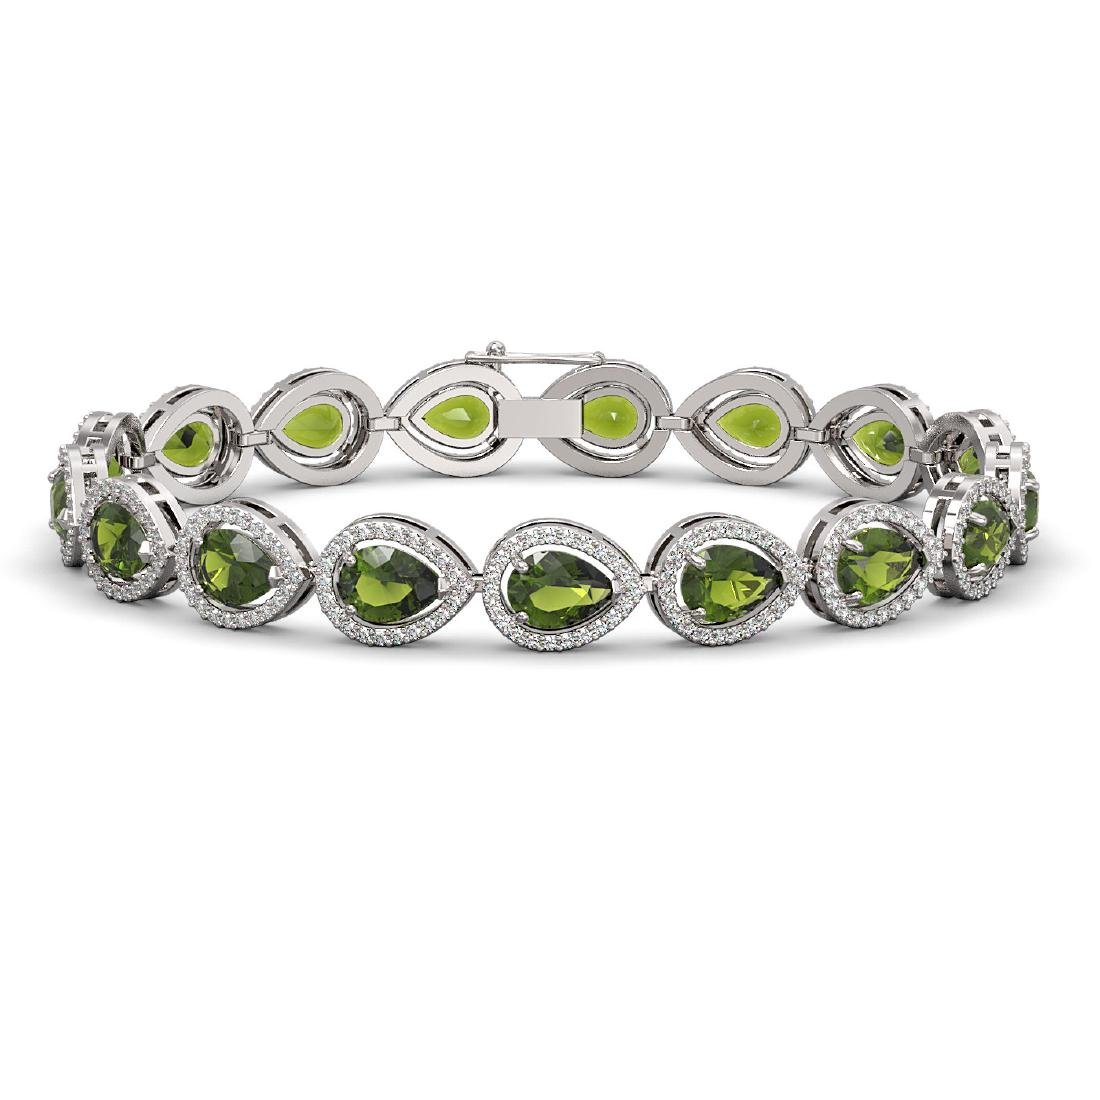 16.93 CTW Tourmaline & Diamond Halo Bracelet 10K White